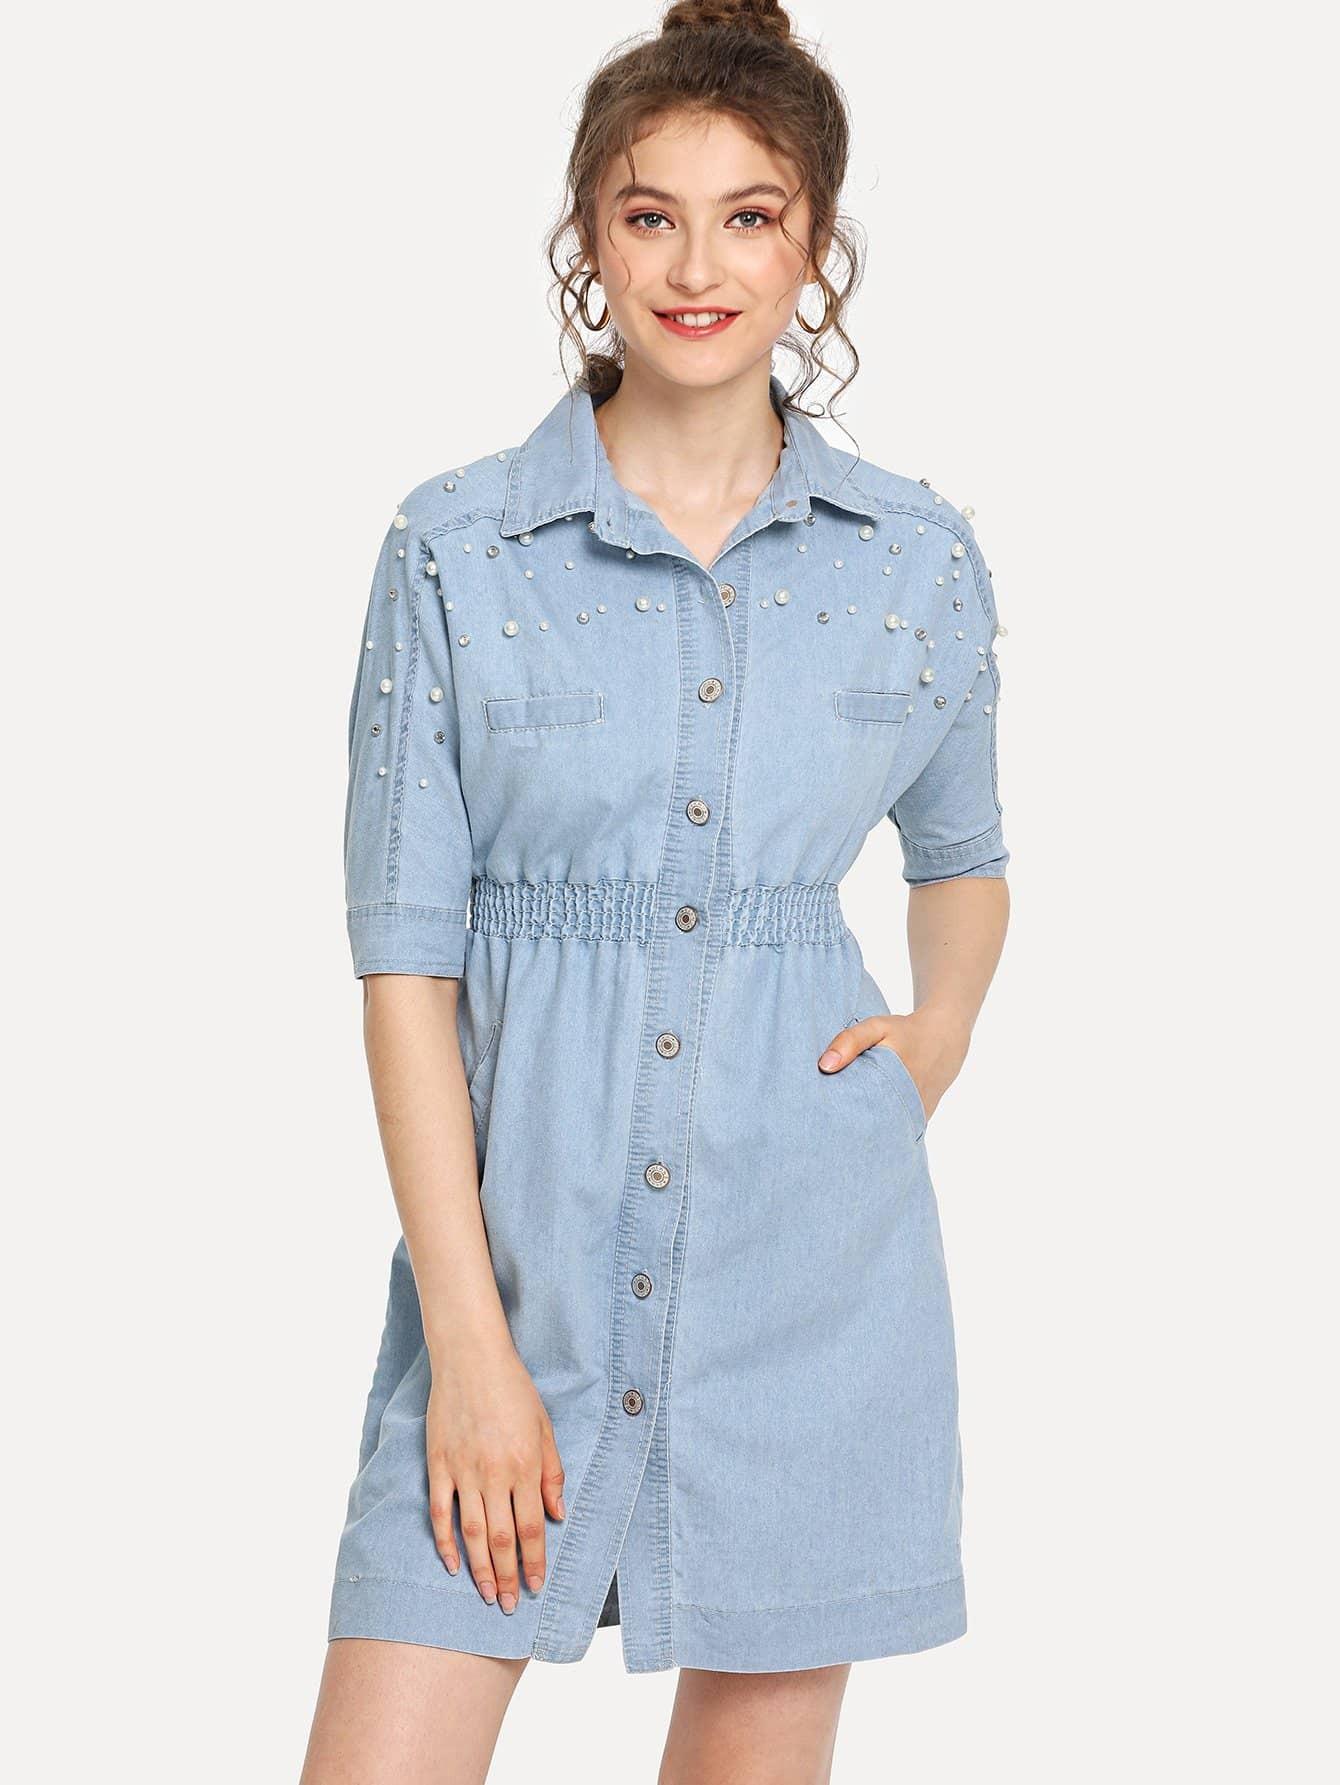 Elastic Waist Button Denim Dress elastic waist button denim dress